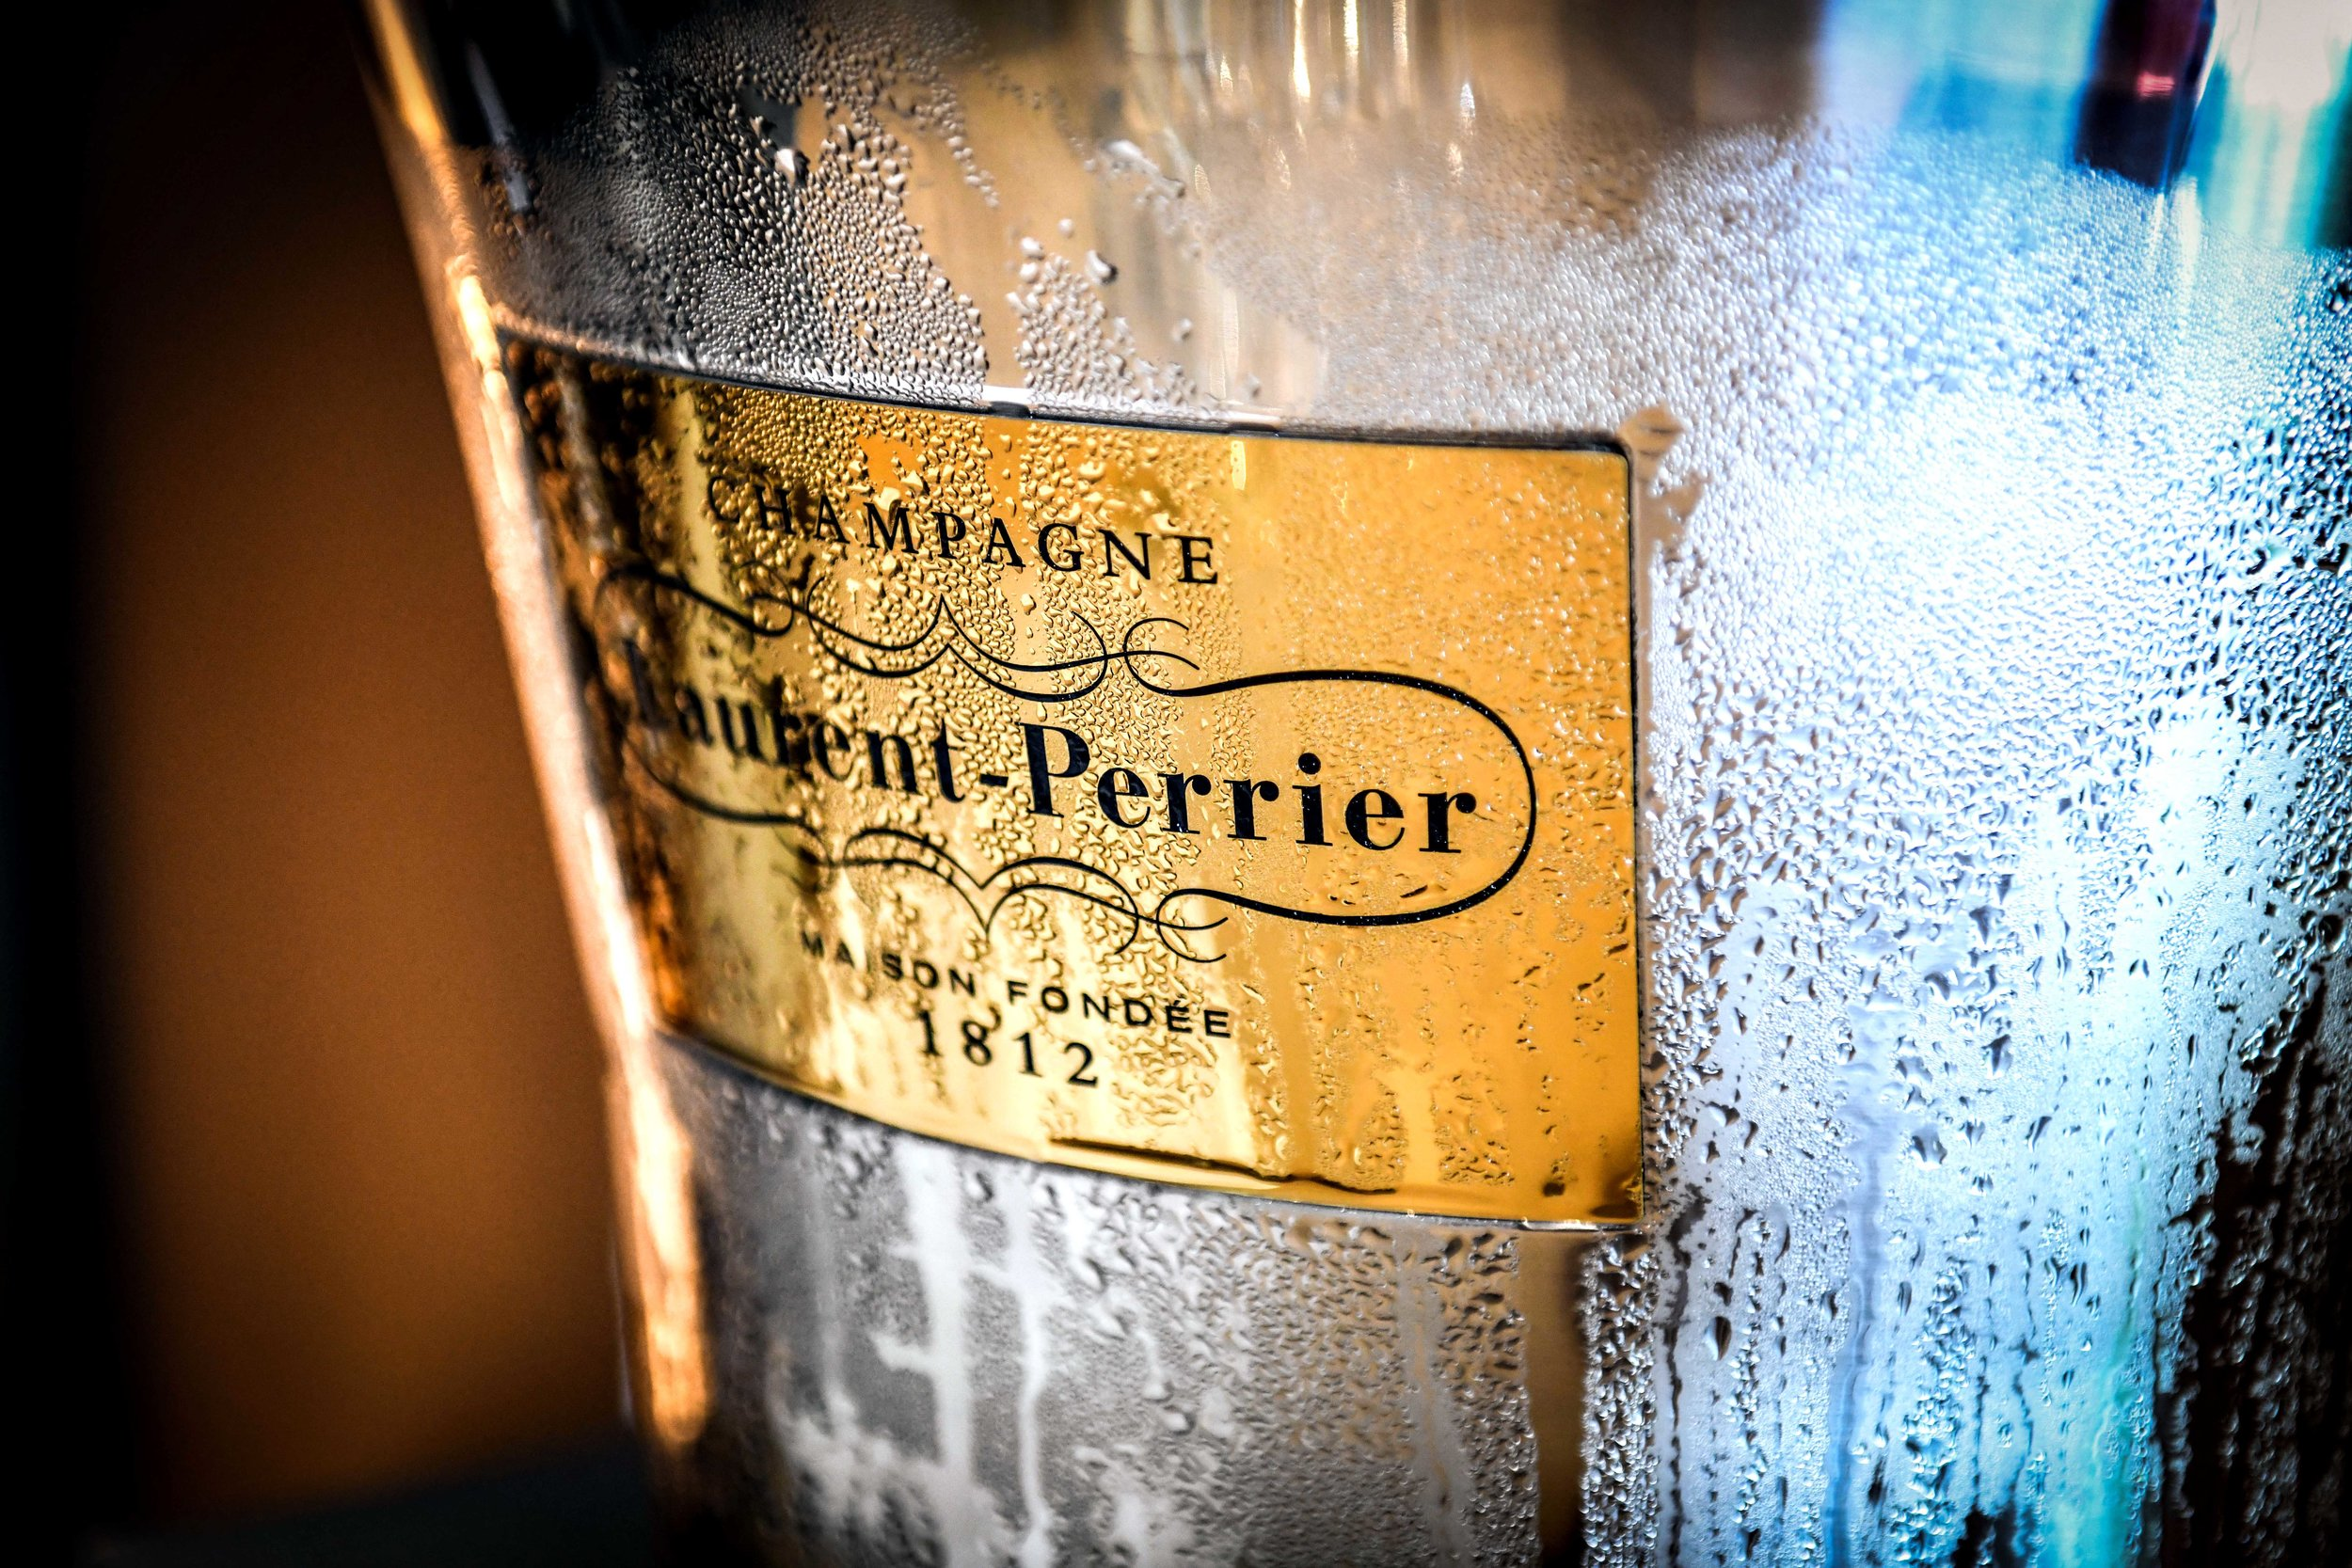 champagne laurent perrier food photographer culinair fotograaf beste culinaire produktfotografie.jpg